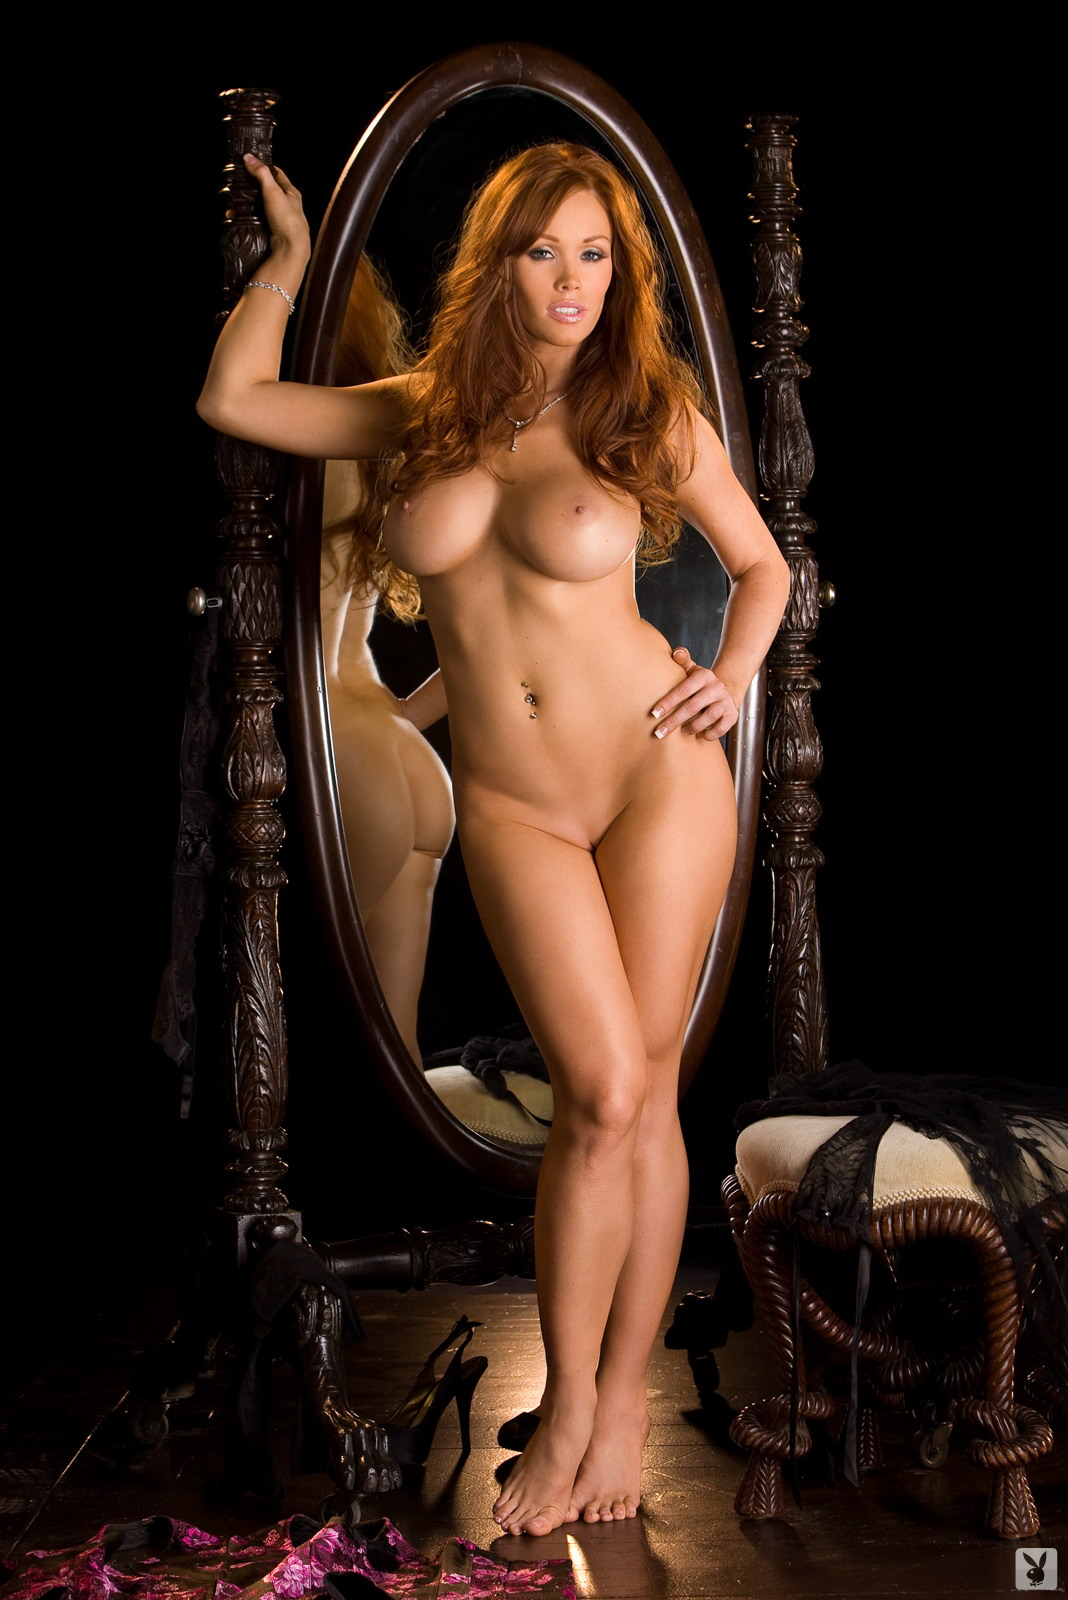 christine-smith-corset-stockings-playboy-16